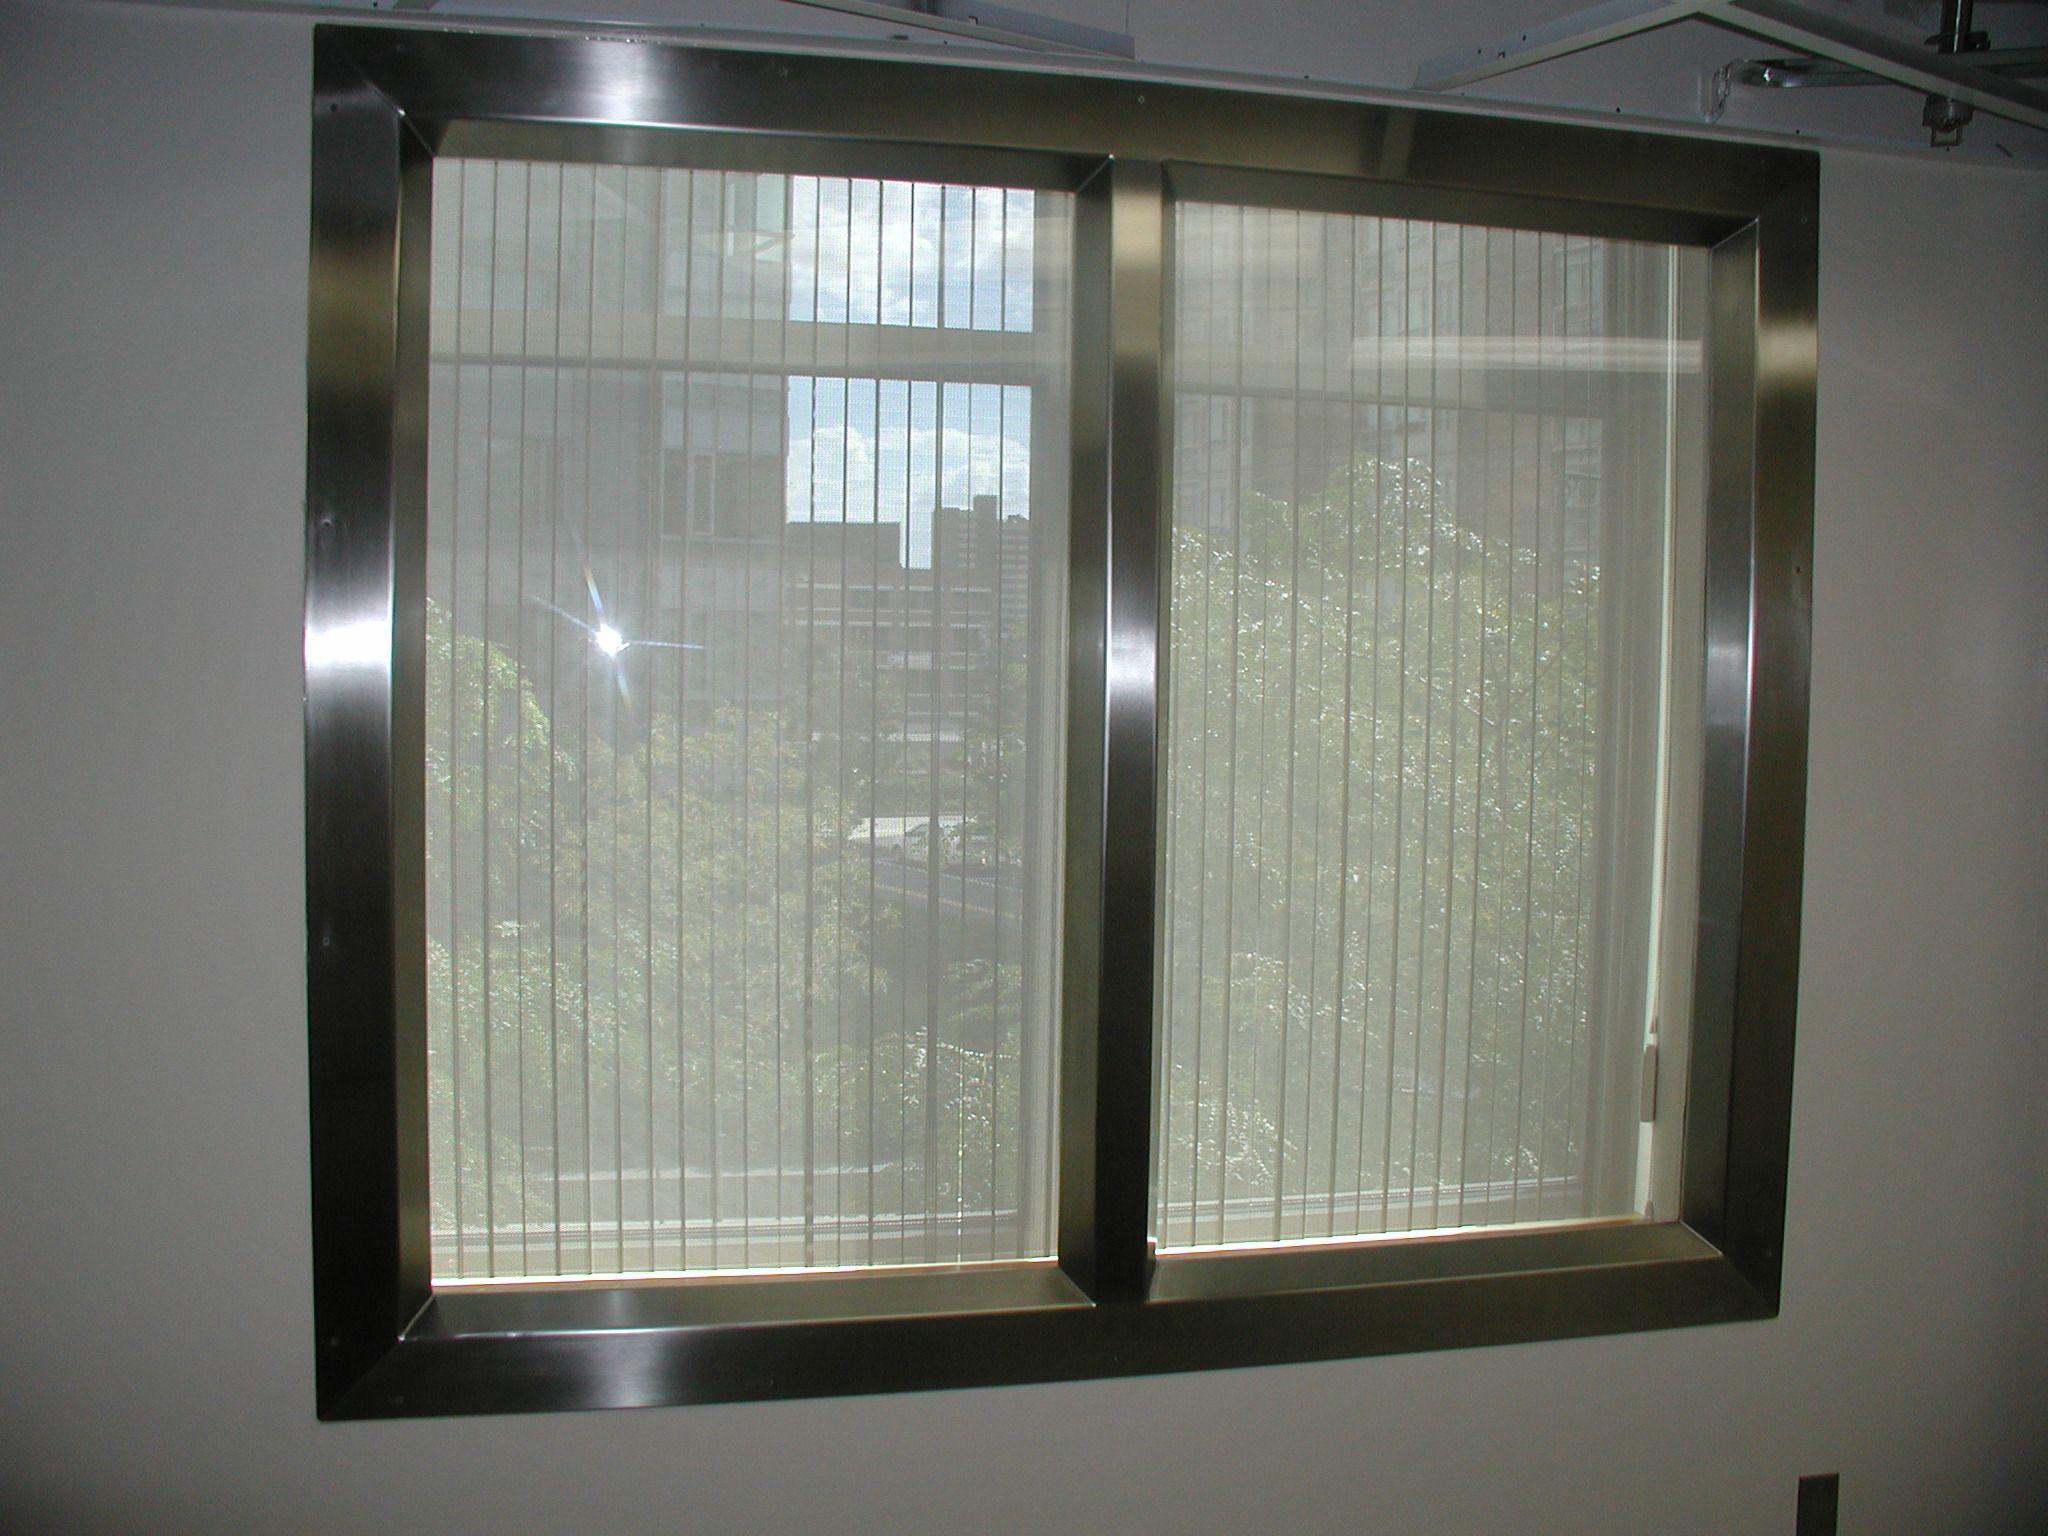 Stainless Steel Window Frame Steel Windows Stainless Steel Welding Window Frame